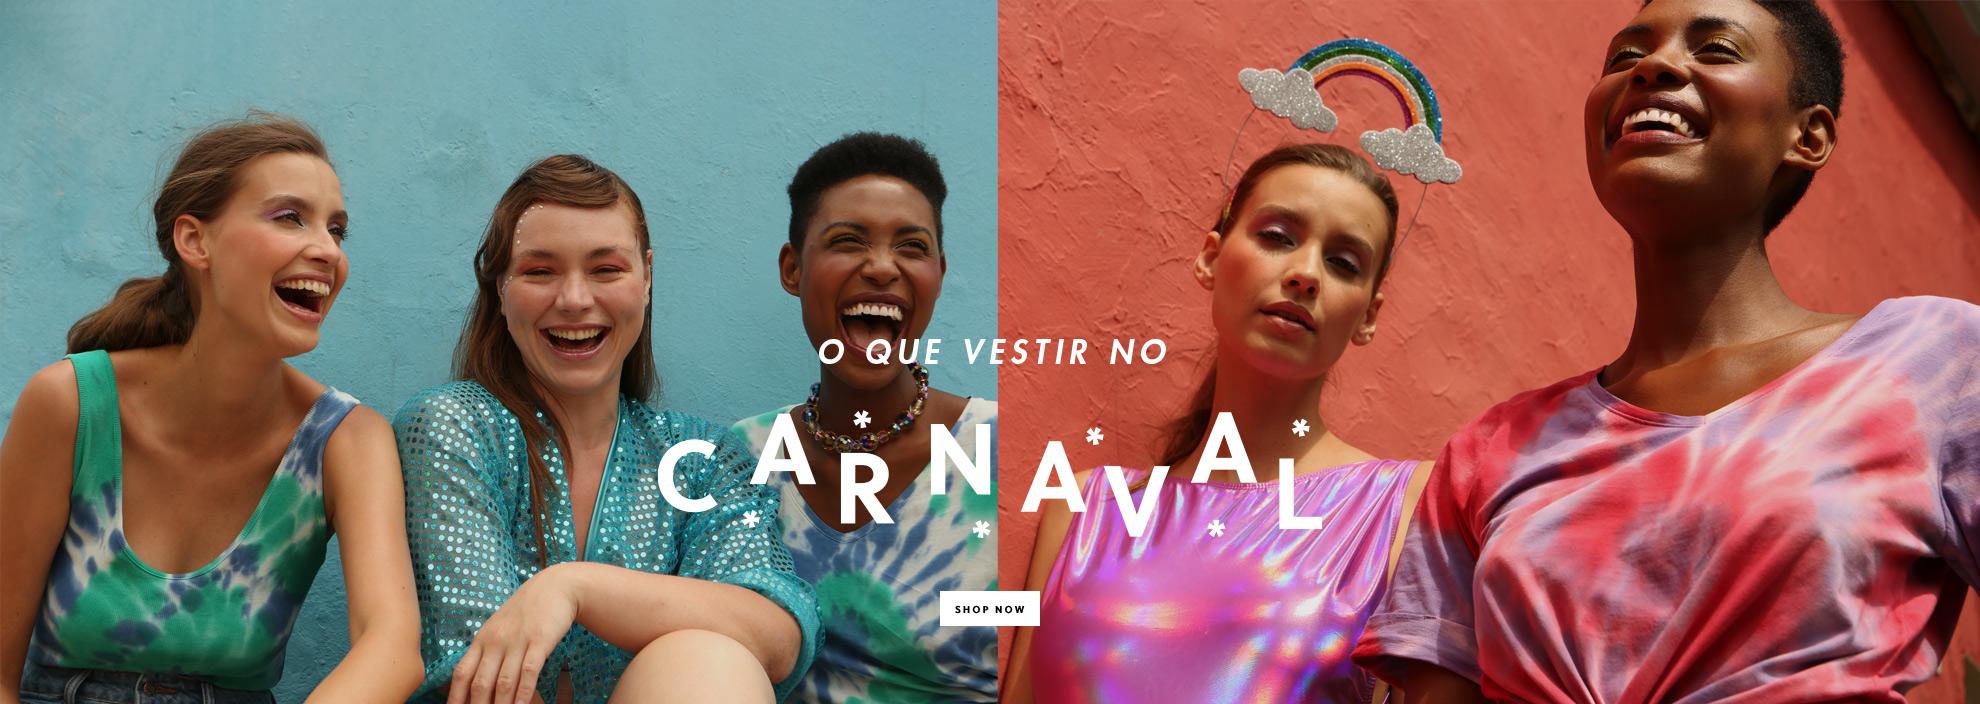 Oqvestir no Carnaval